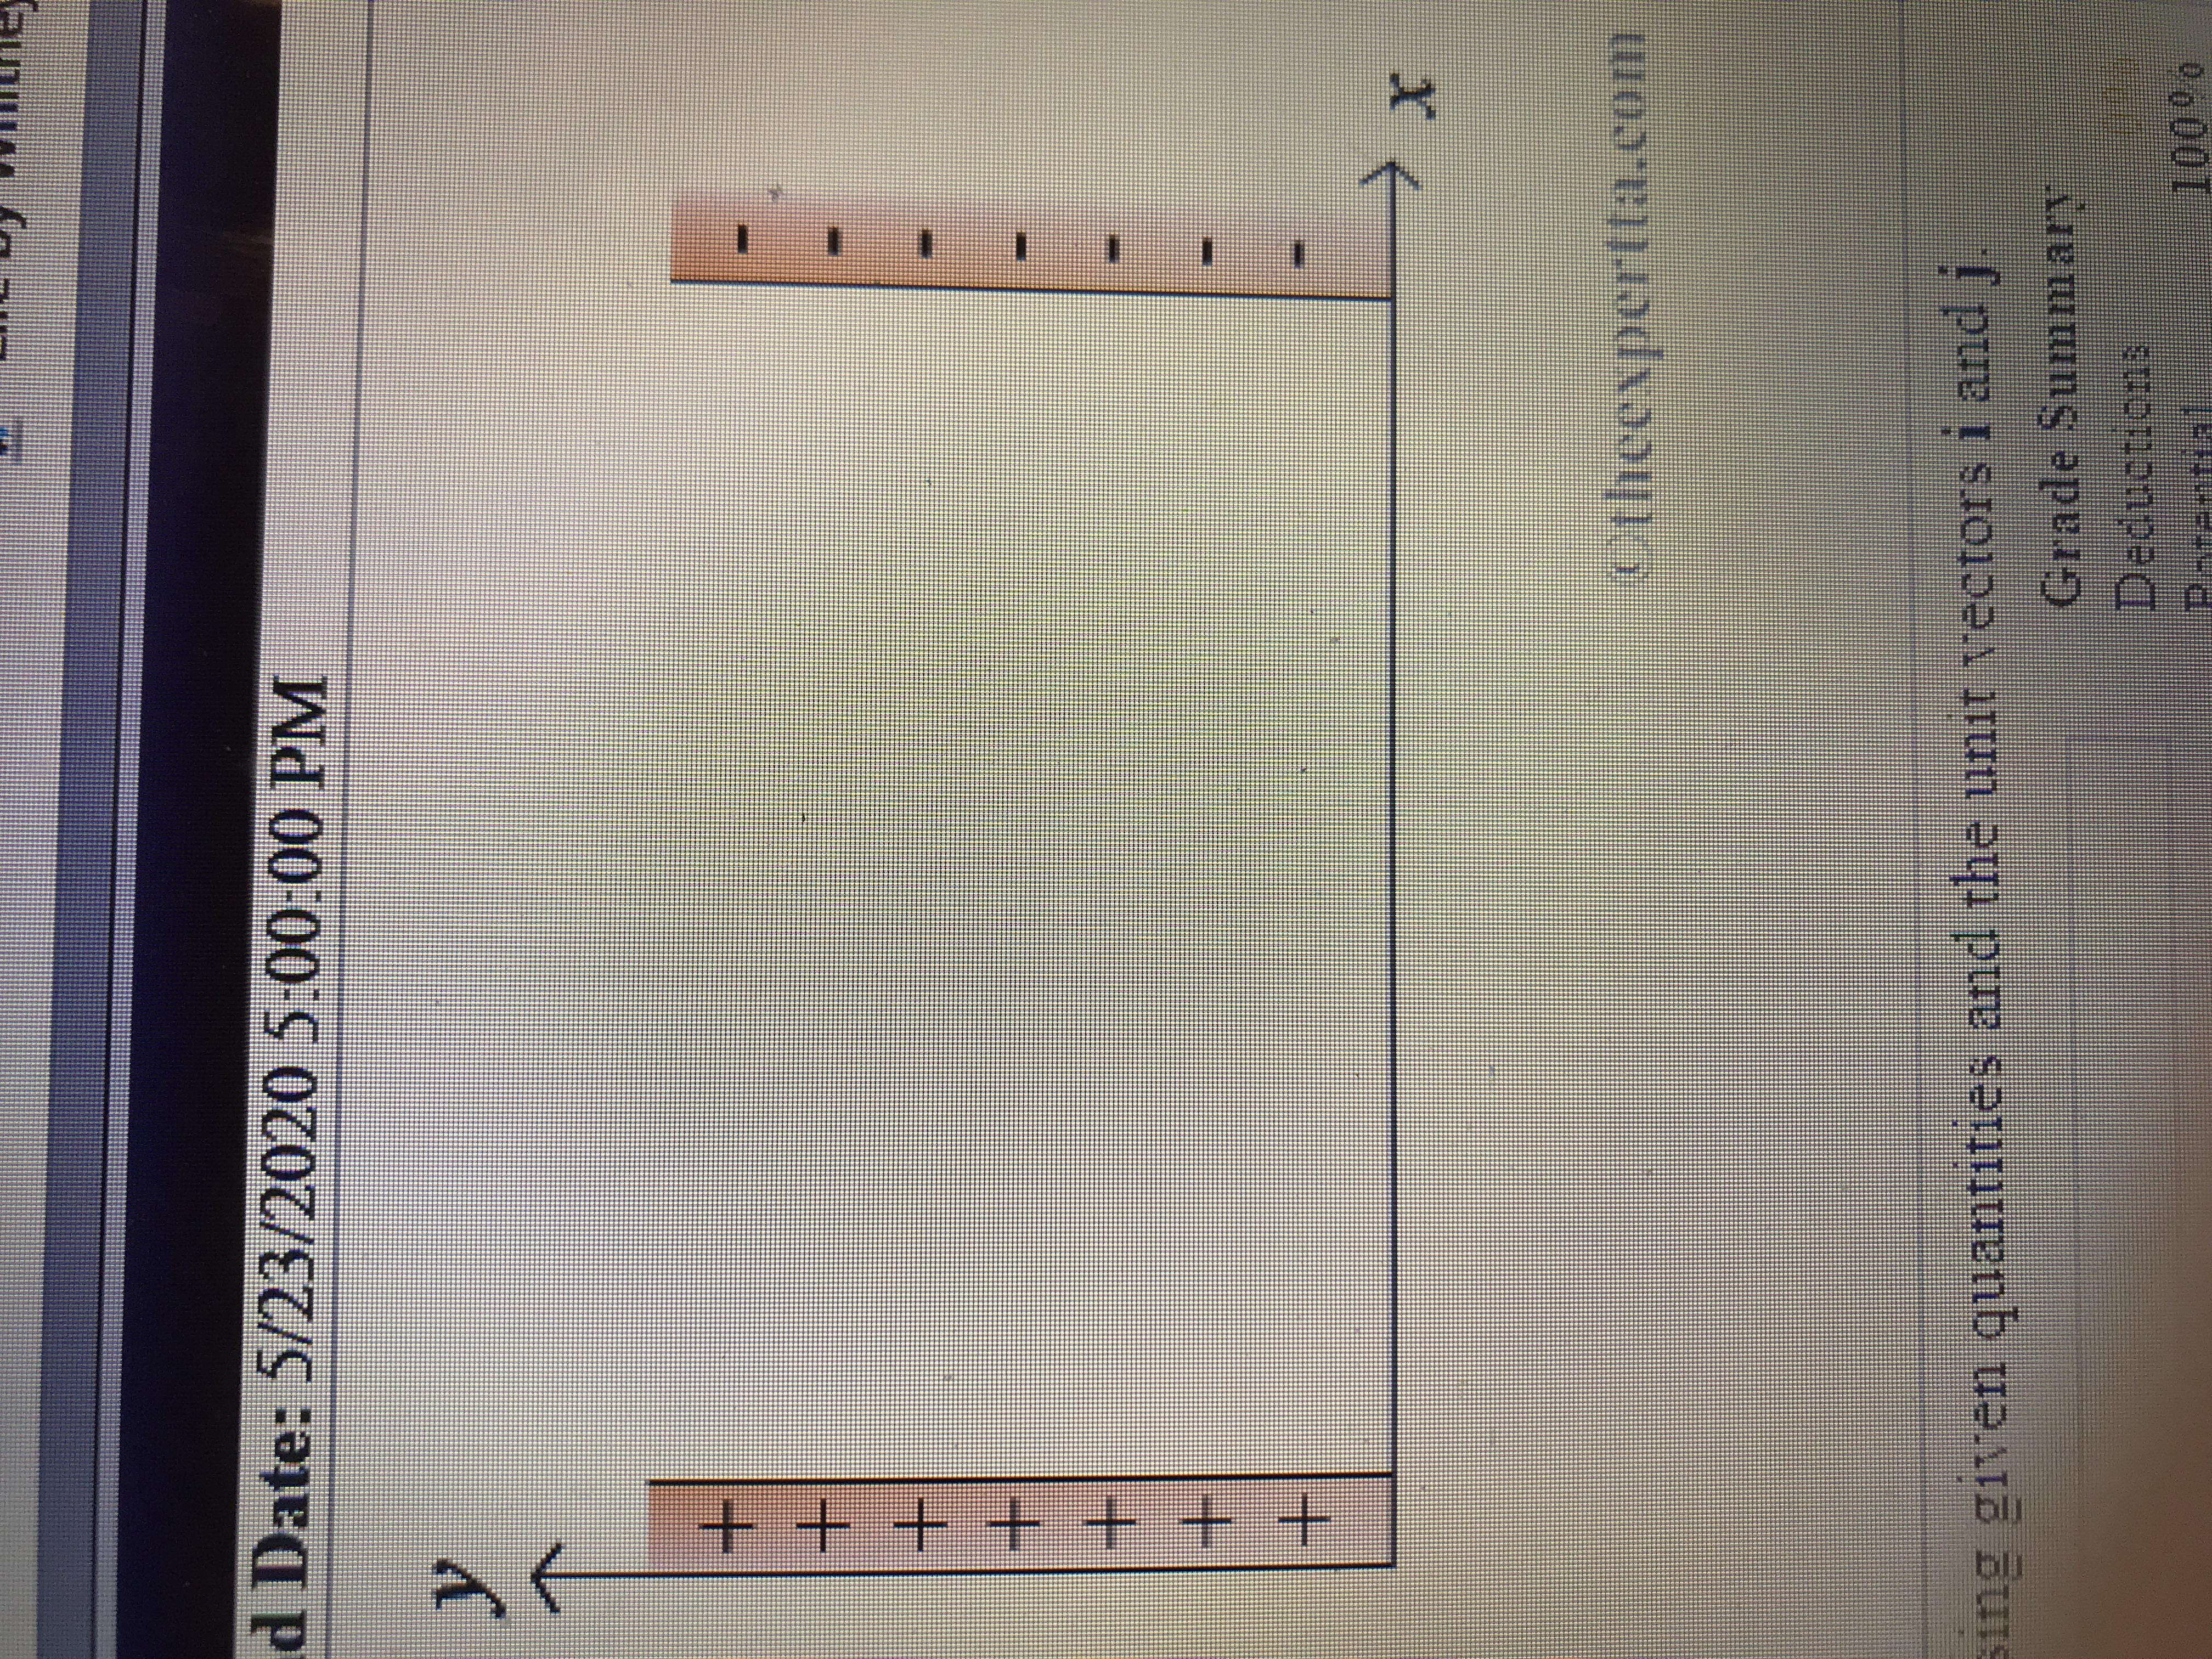 d Date: 5/23/2020 5:00:00 PM etheexpertta.com Sing given quantities and the unit ectors i andj. Grade Summary Deductions Parential 1000 0 +++++ + +